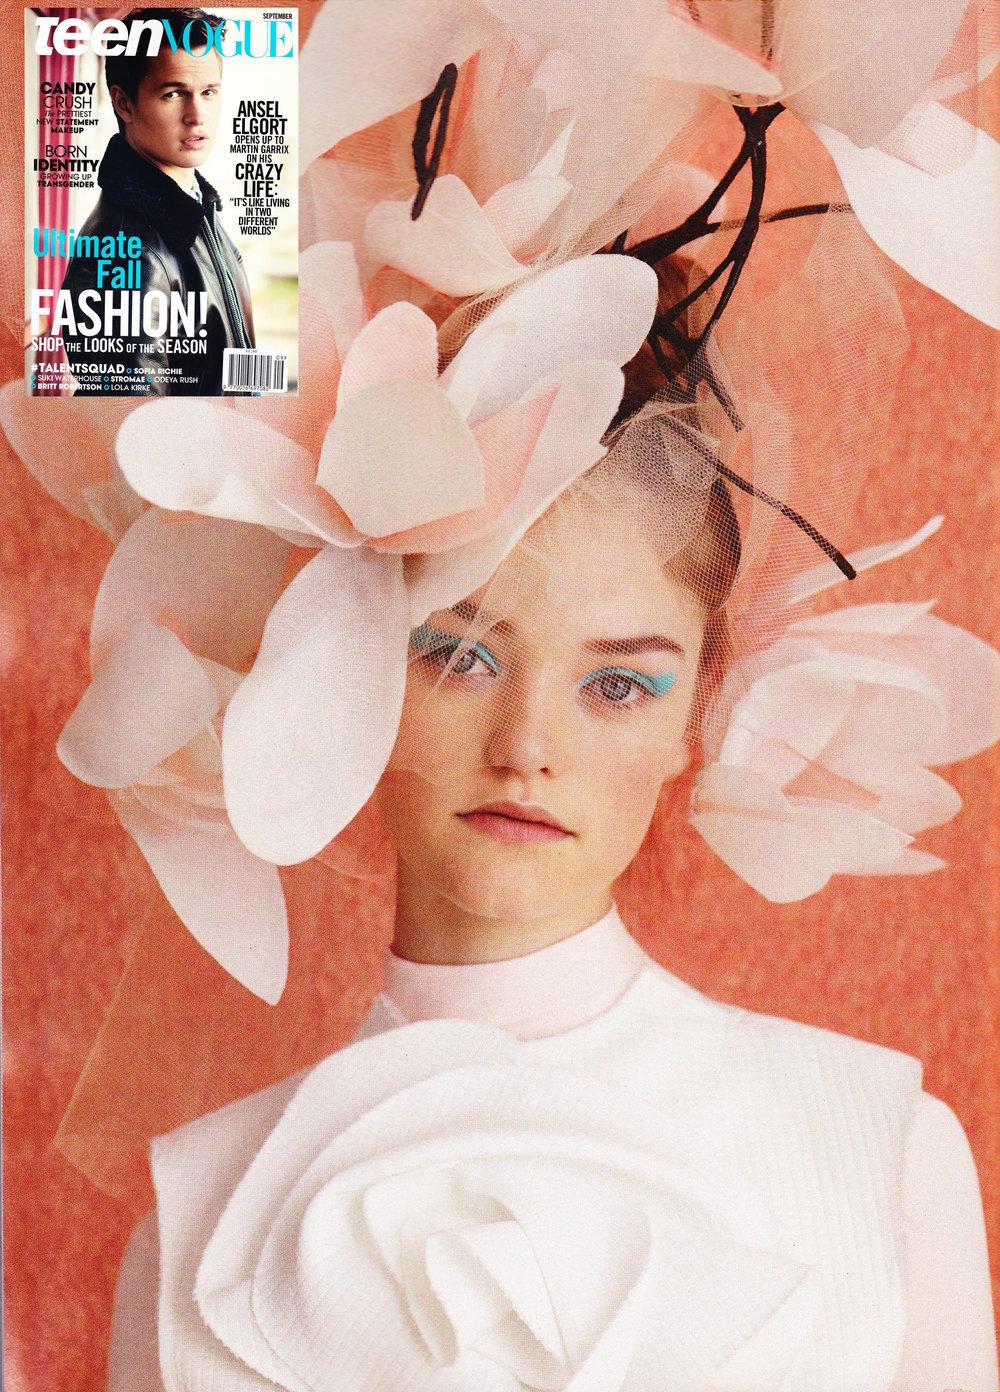 Teen Vogue Sept15 page168.jpg